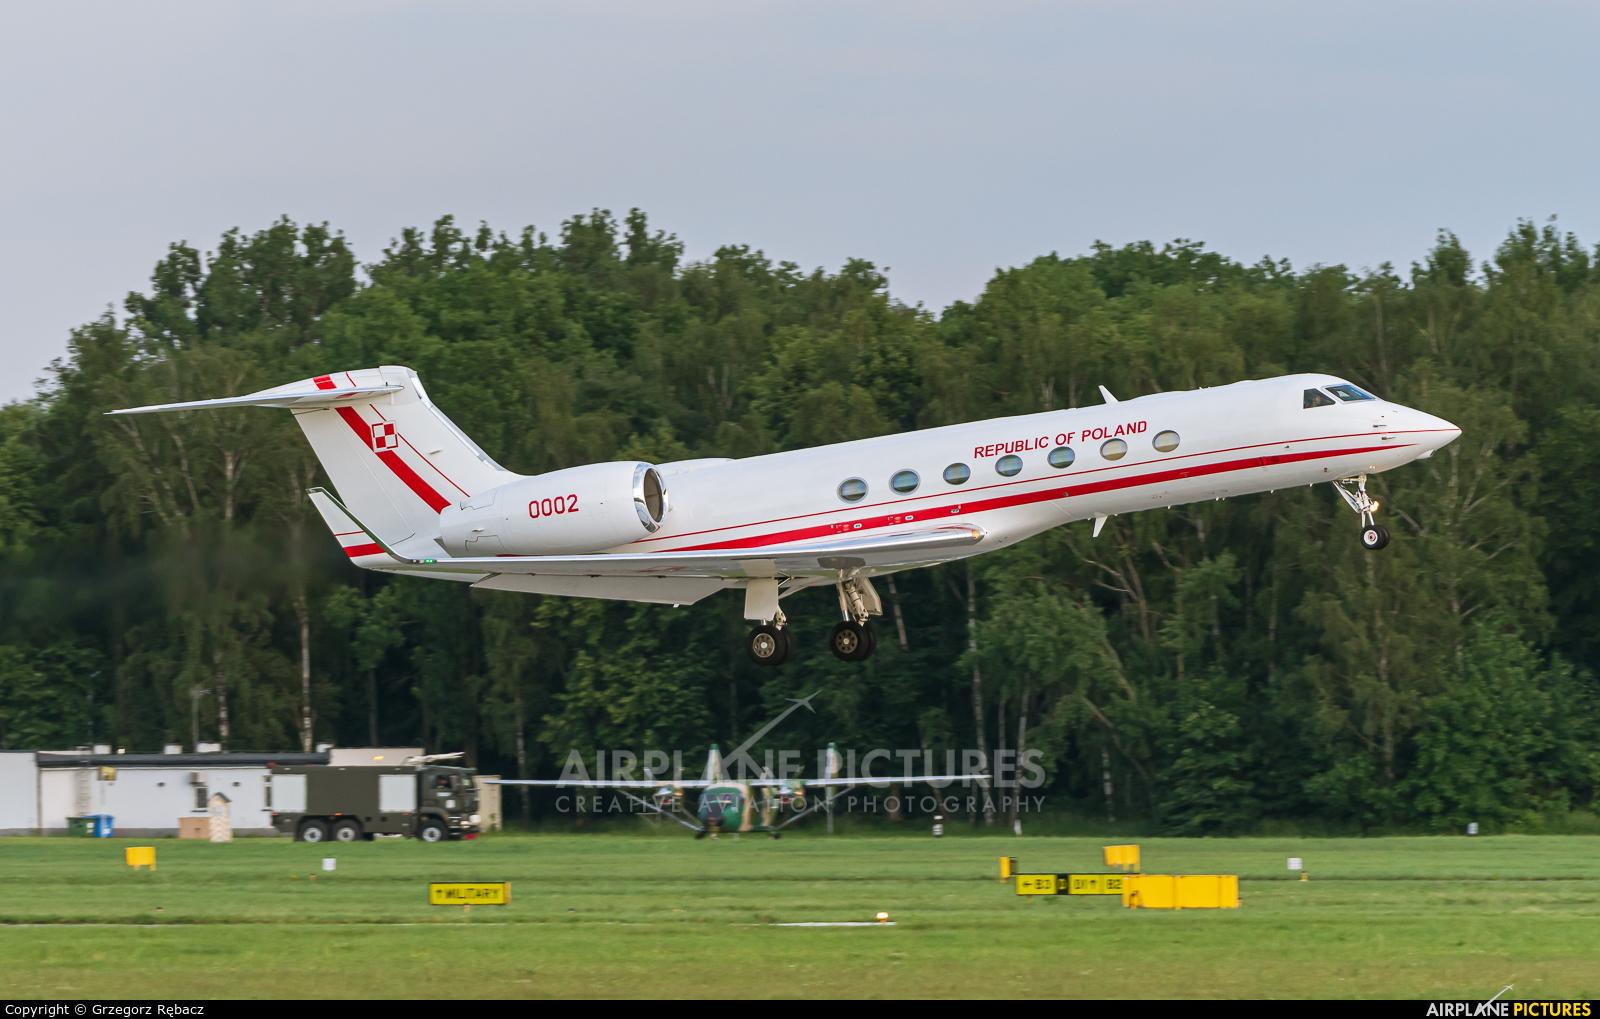 Poland - Air Force 0002 aircraft at Kraków - John Paul II Intl